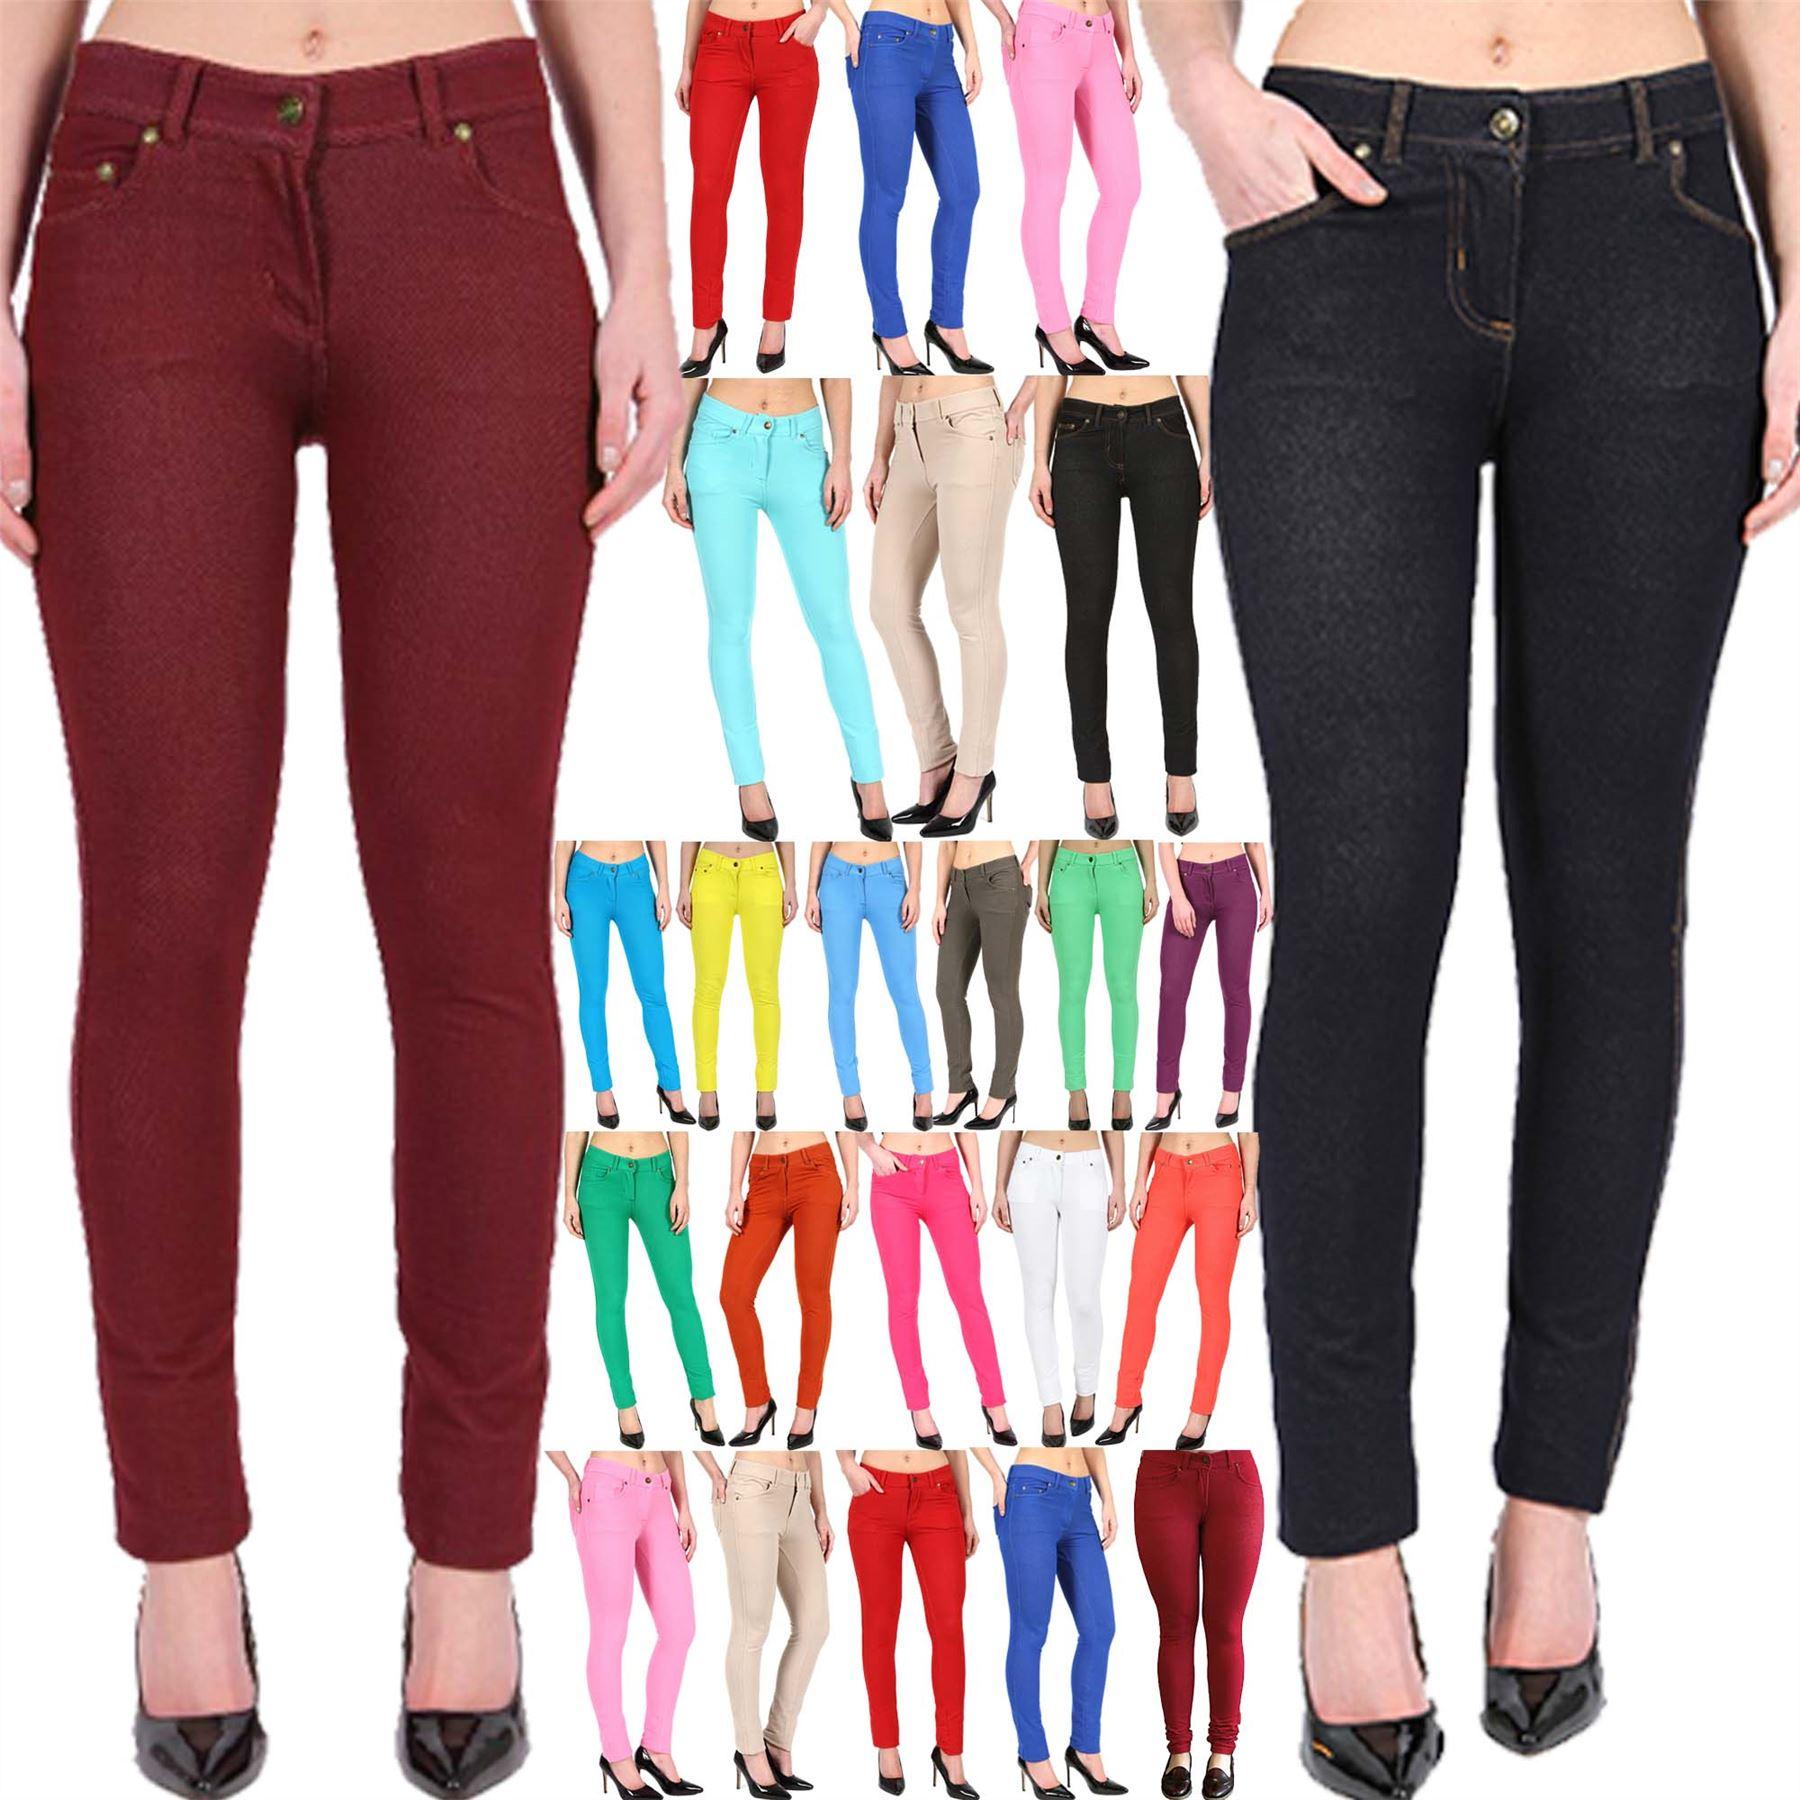 New Ladies Skinny Leggings Jeggings Womens Coloured ...